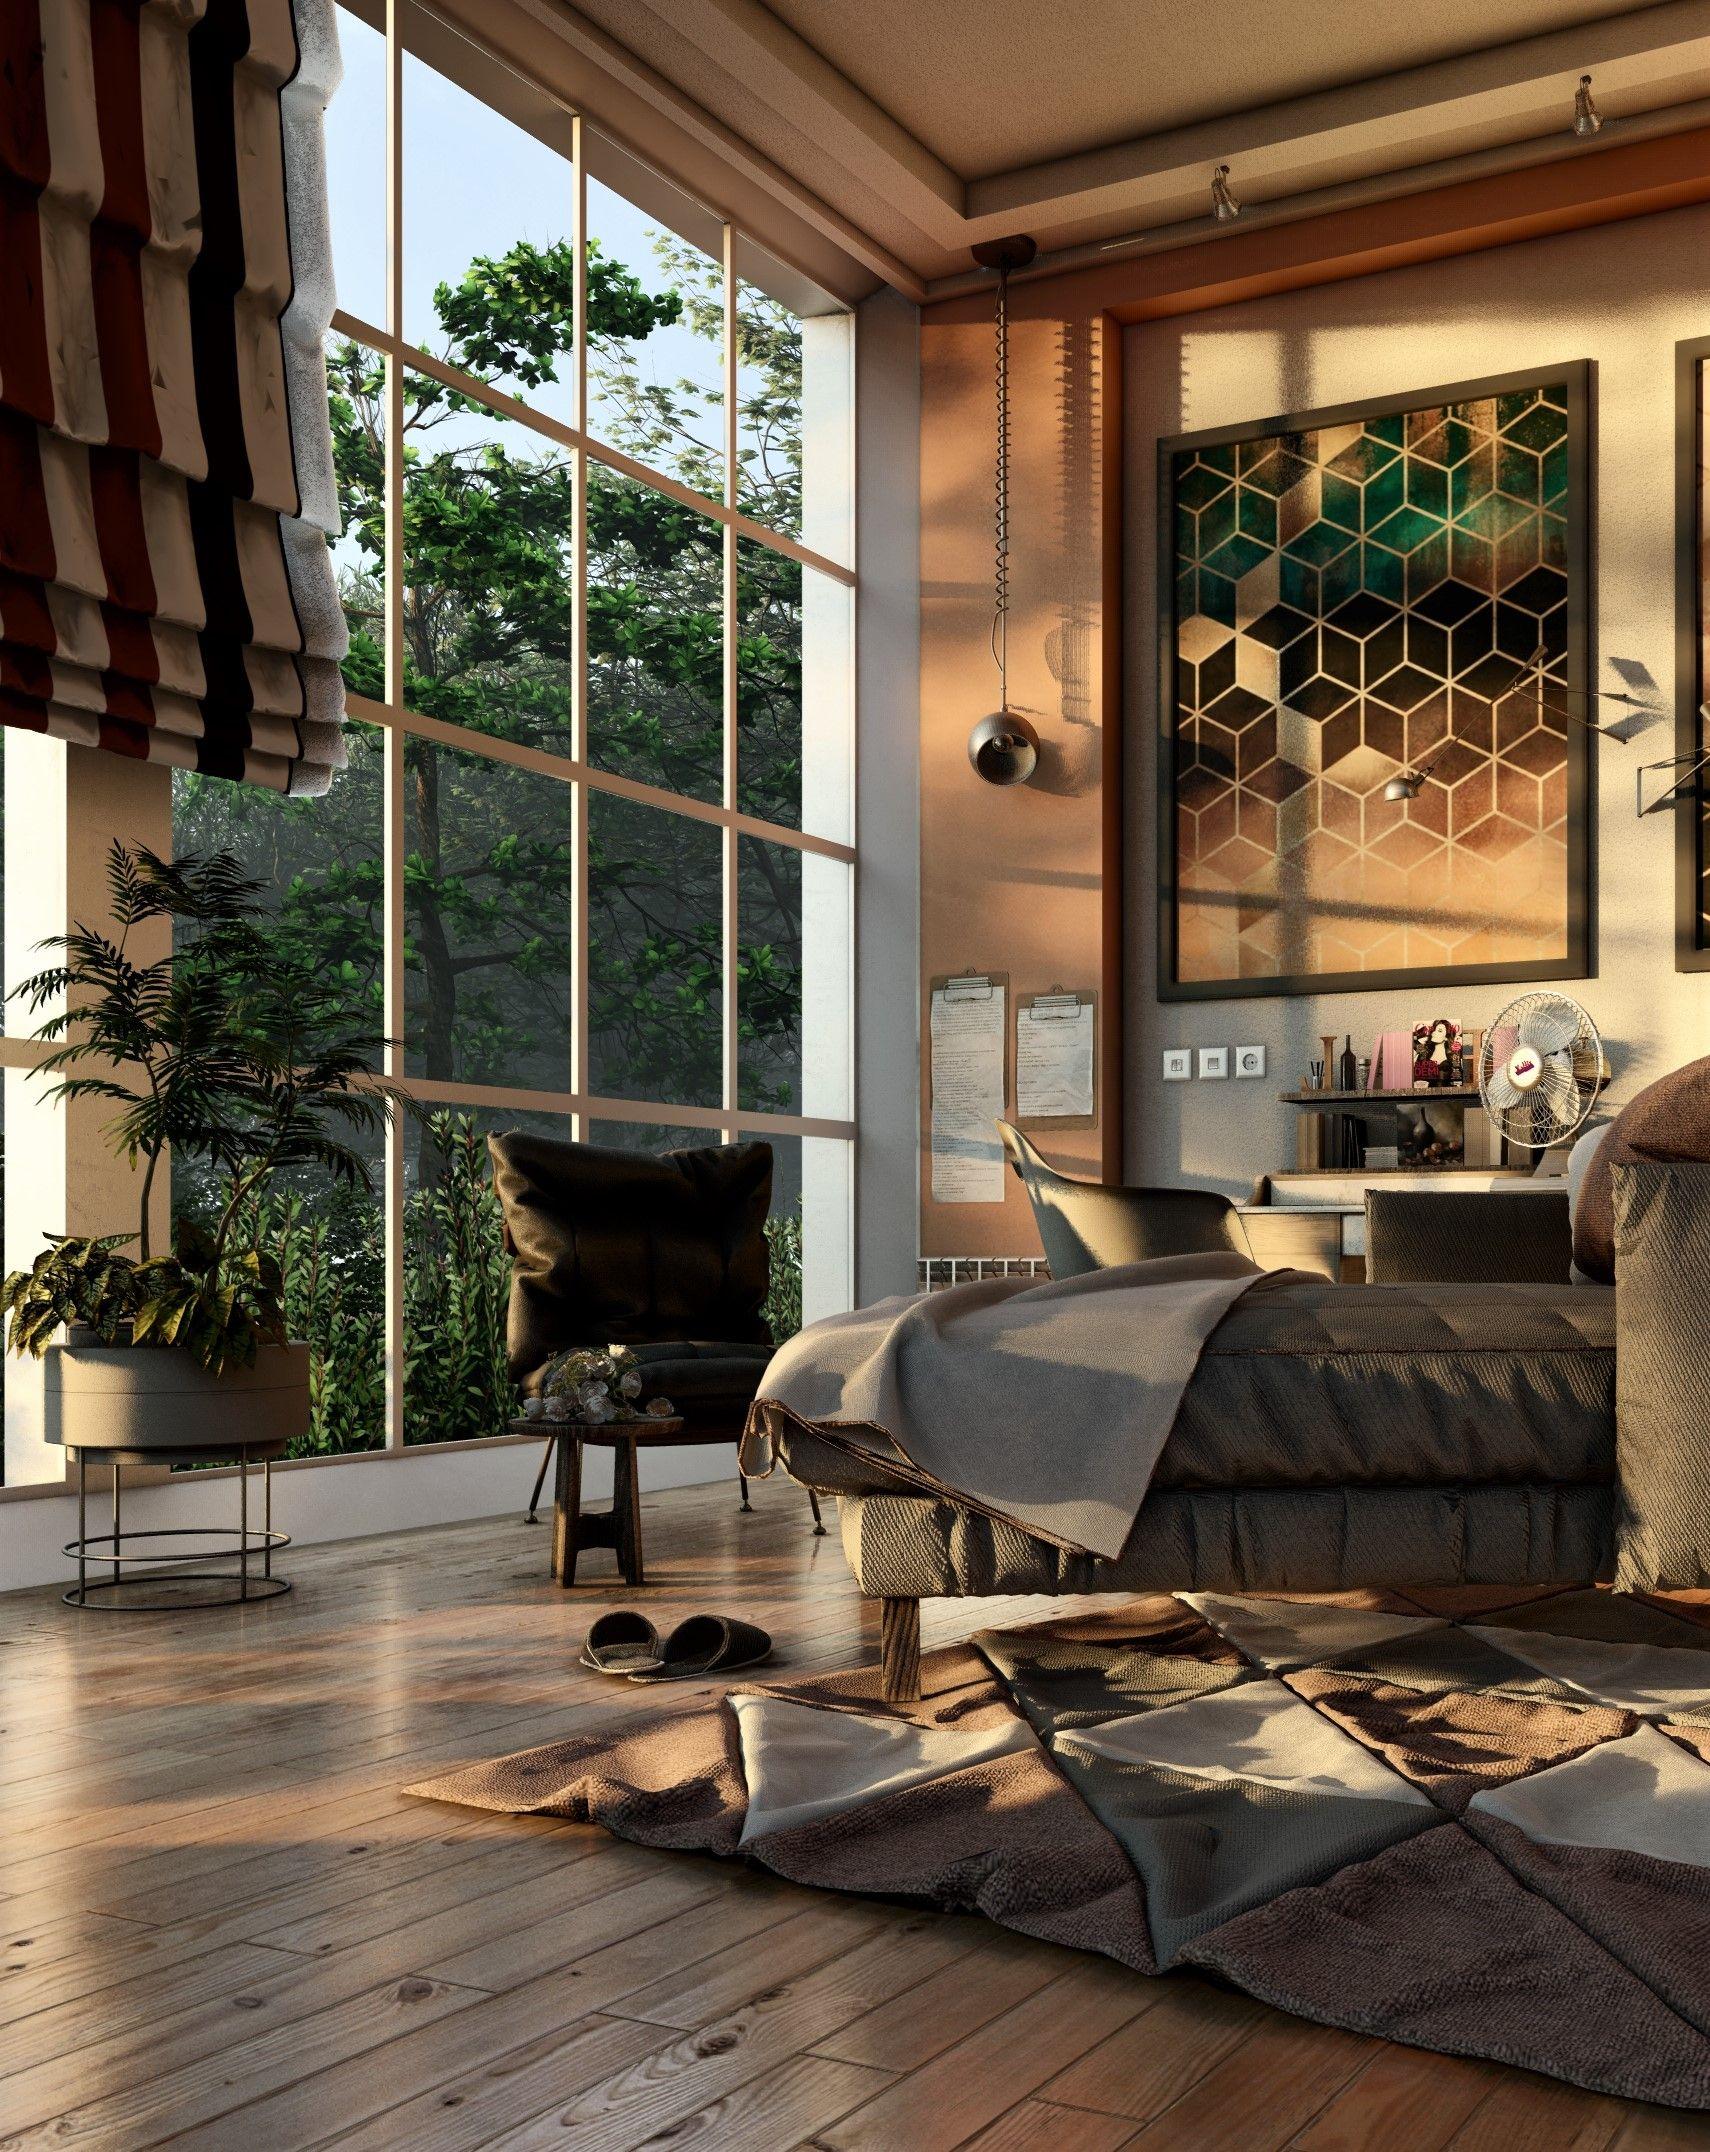 3d Room Interior Design: #Bedroom #interior, #rendered In #Lumion9 By Mostafa